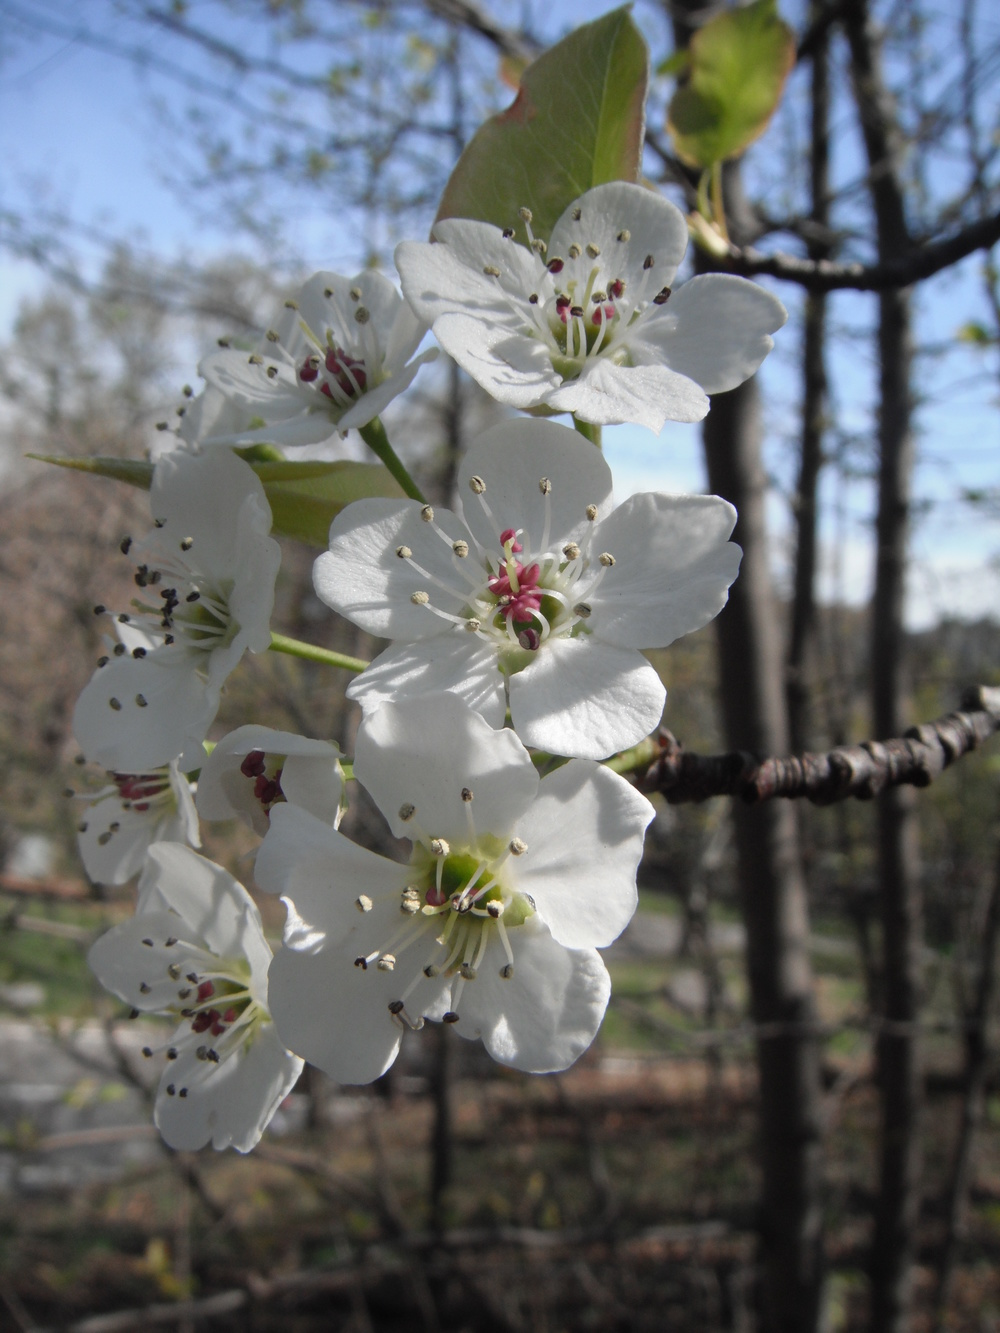 Pyrus calleryanaBradford pear Rosaceae